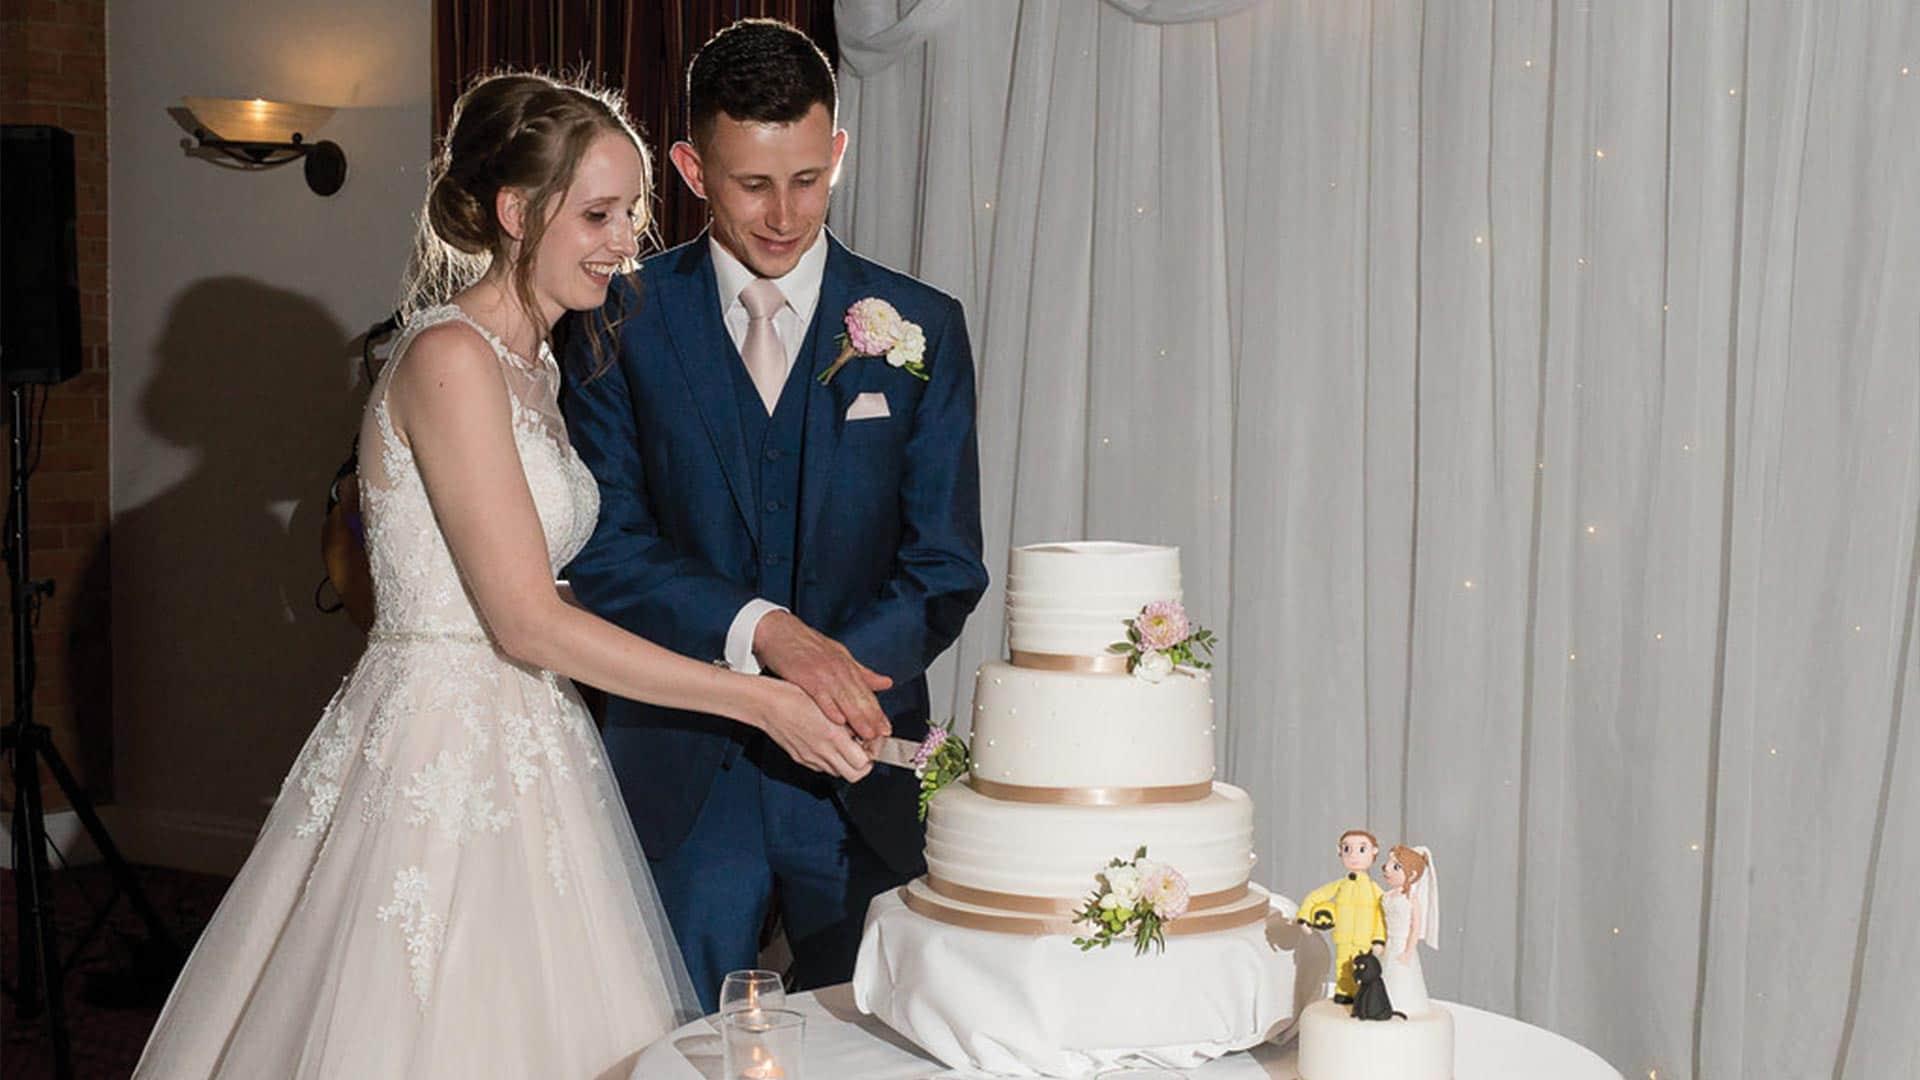 wedding cakes, Haslington, Crewe, Cheshire